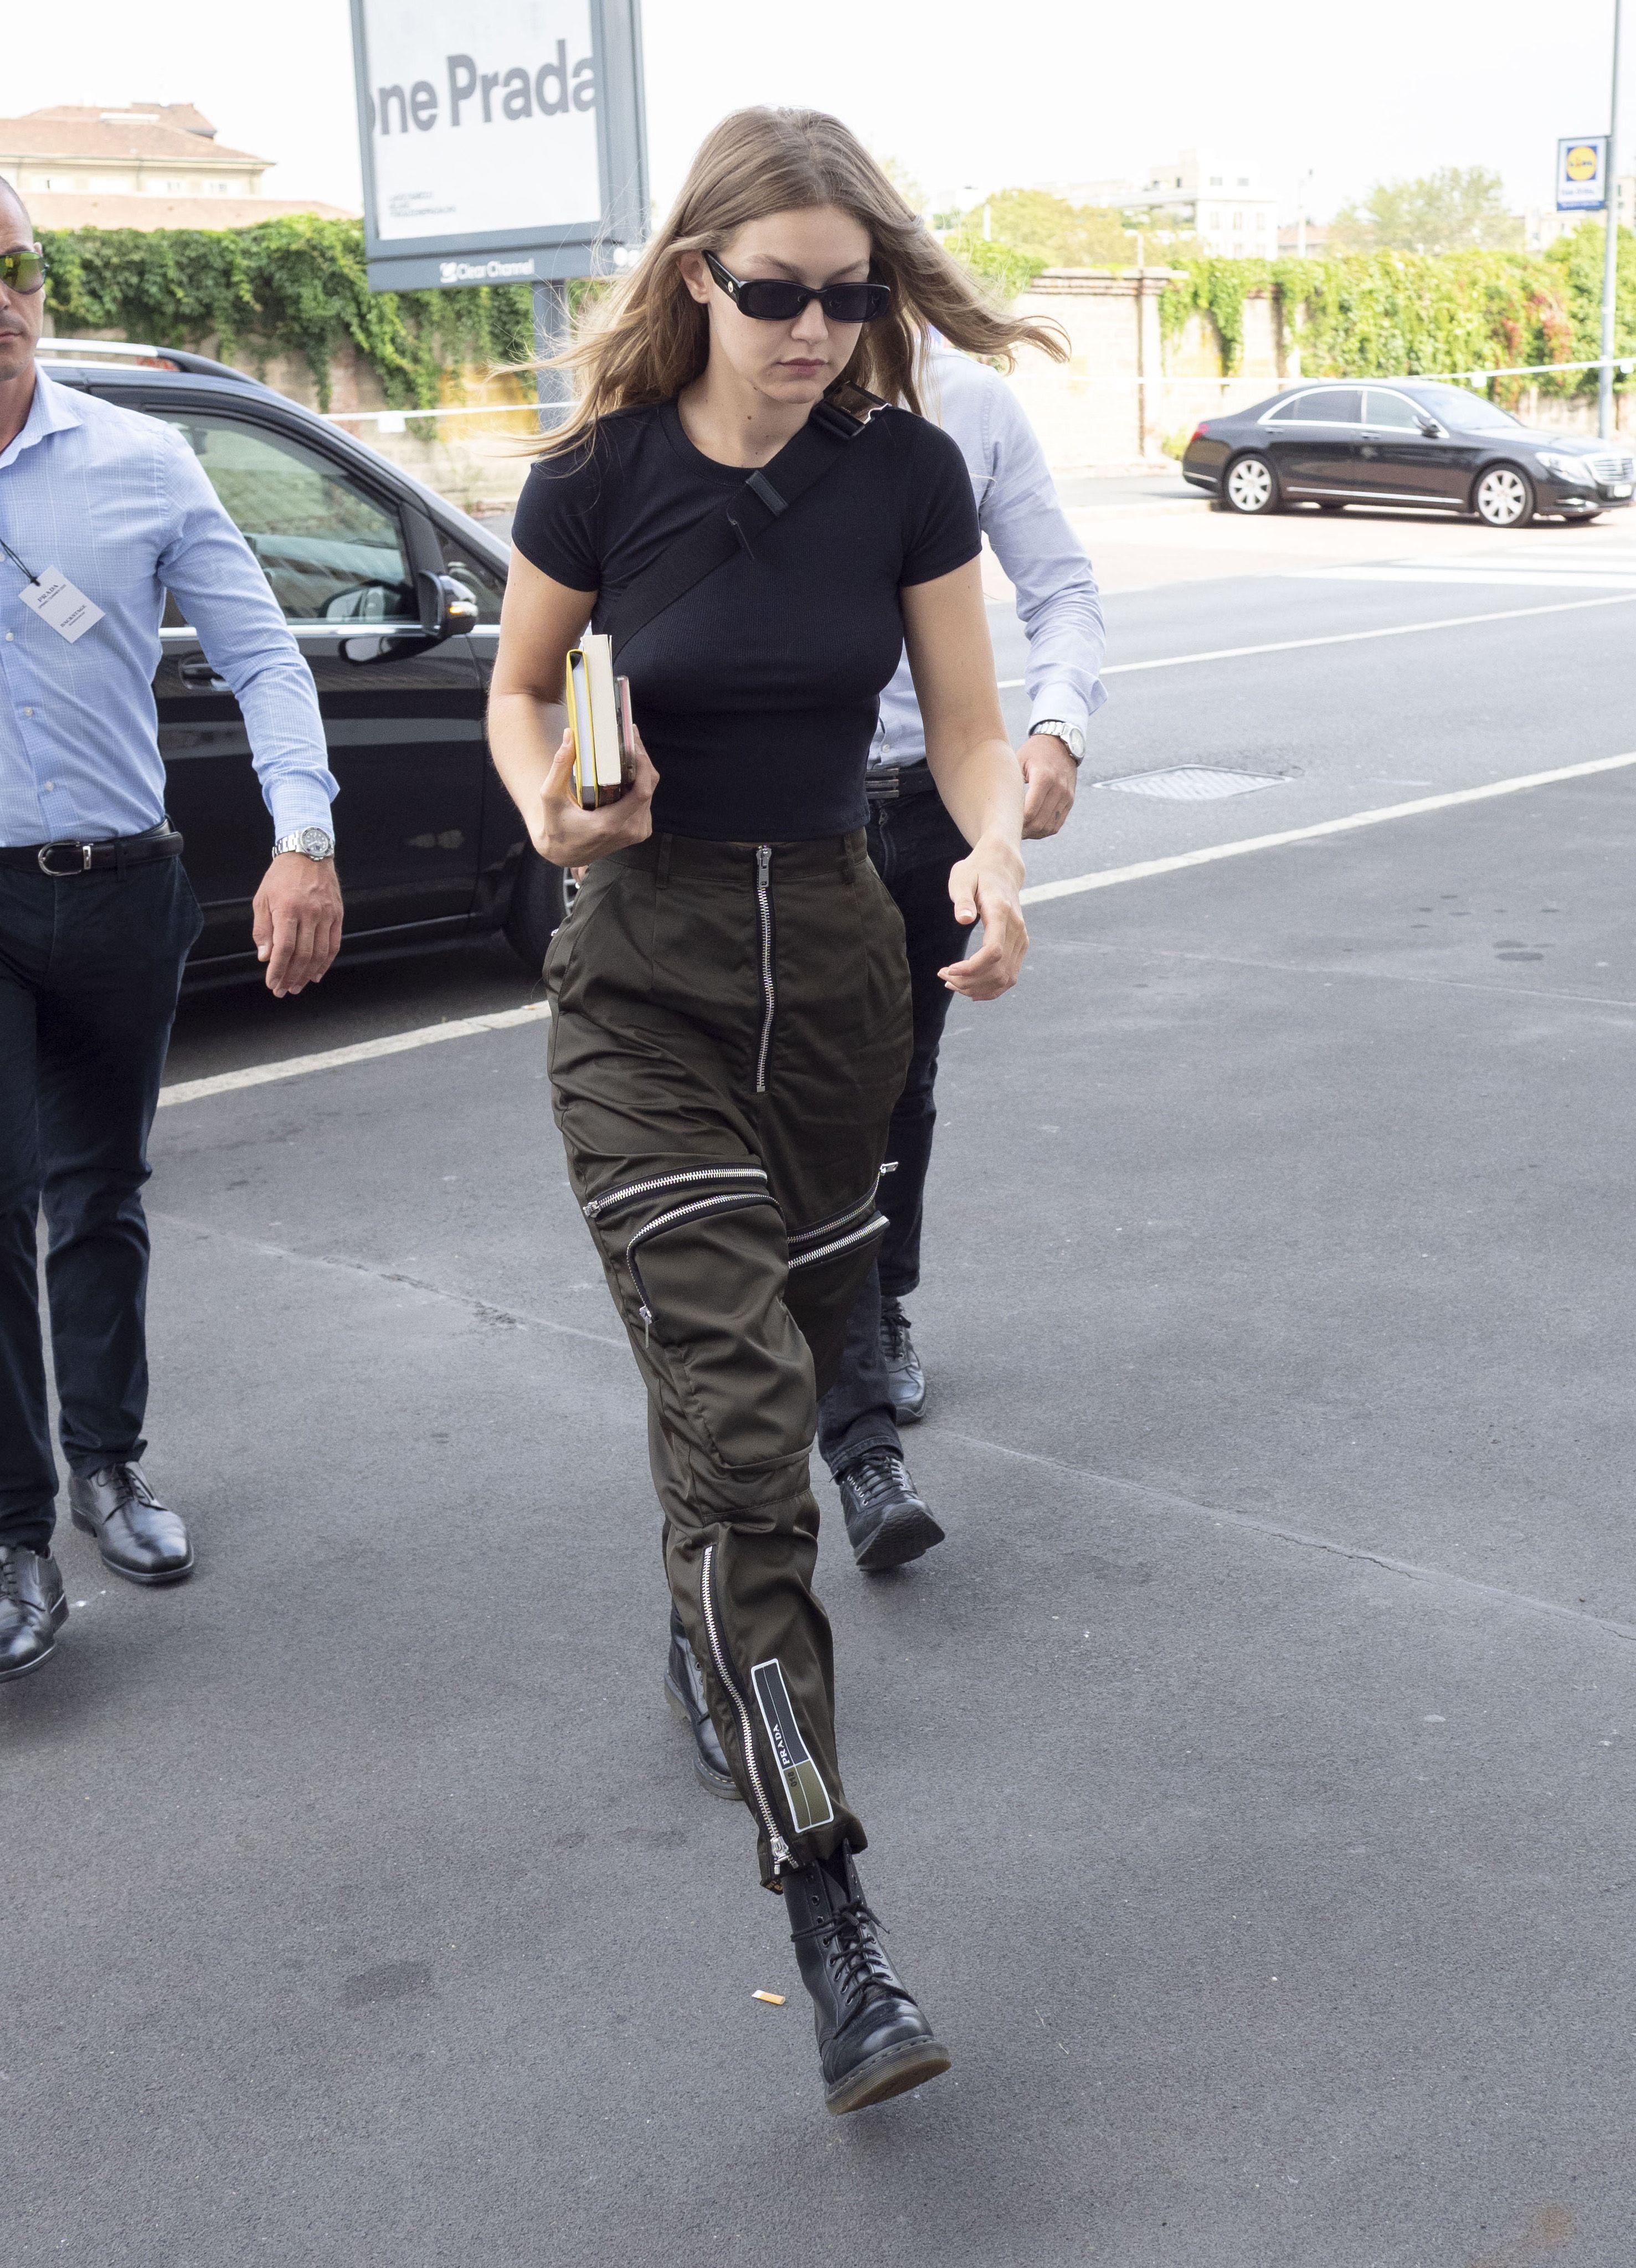 Gigi Hadid Dr. Martens Outfits